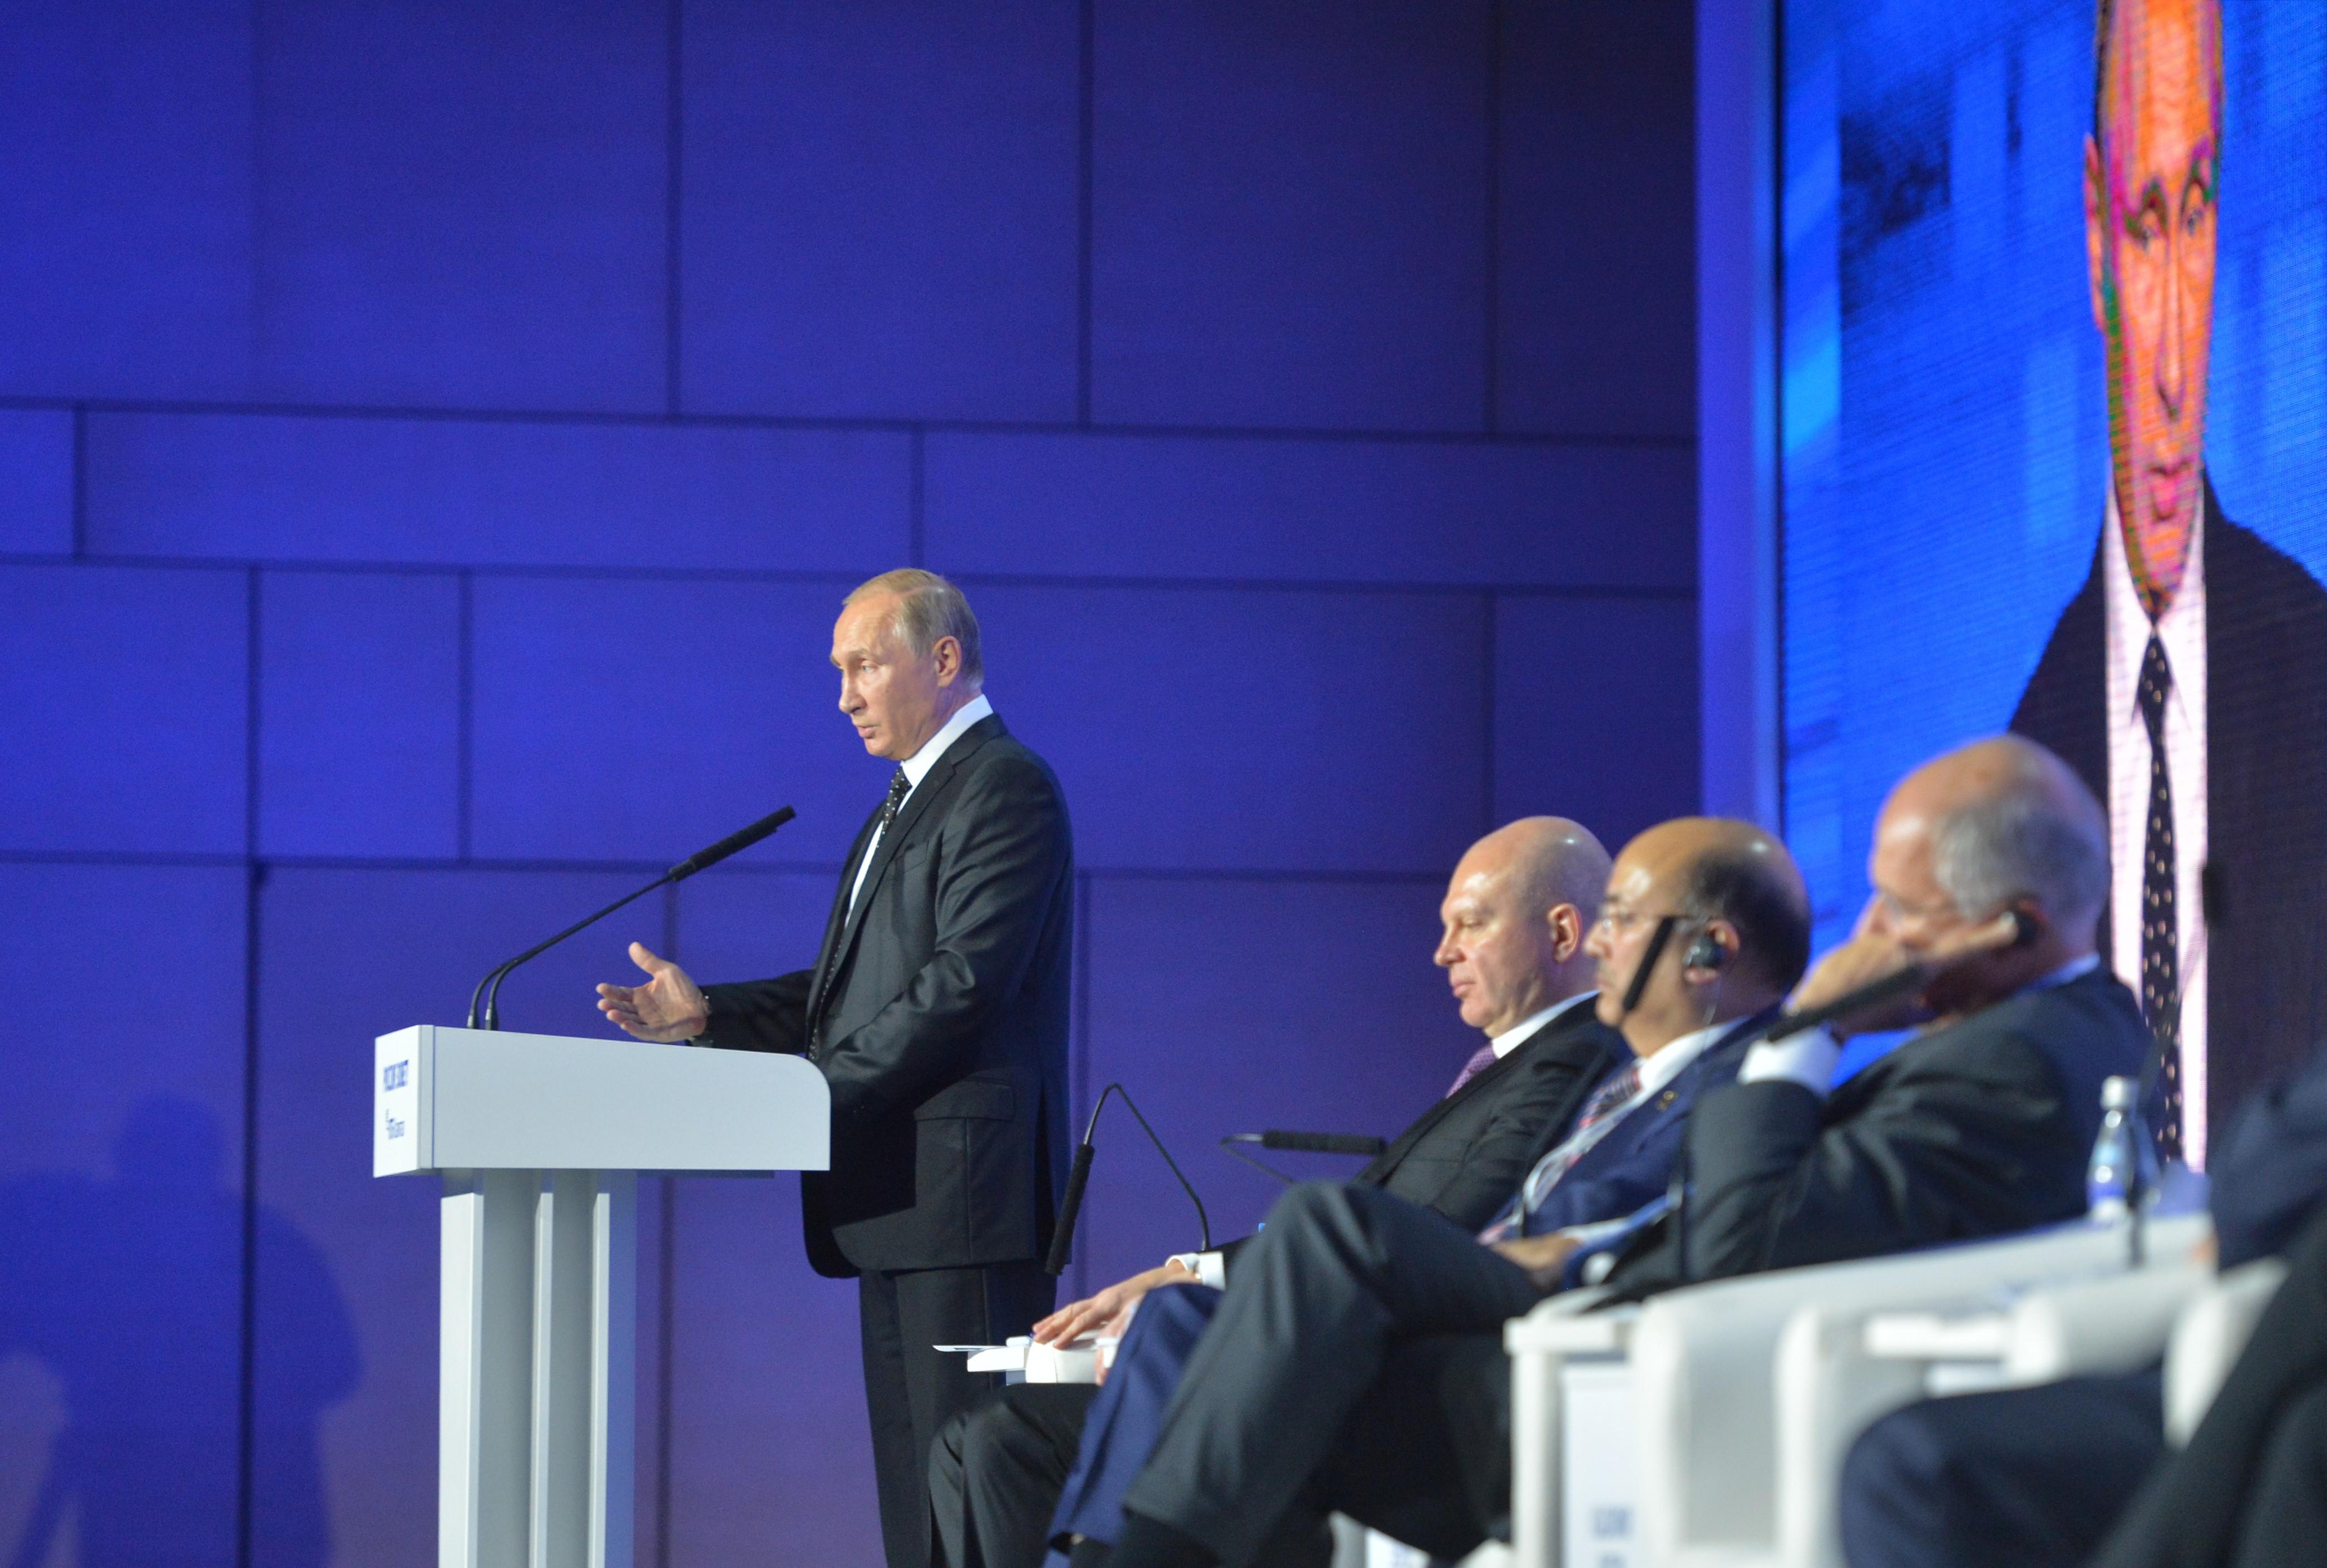 <p><span>Фото: &copy;РИА Новости/Алексей Дружинин</span></p>